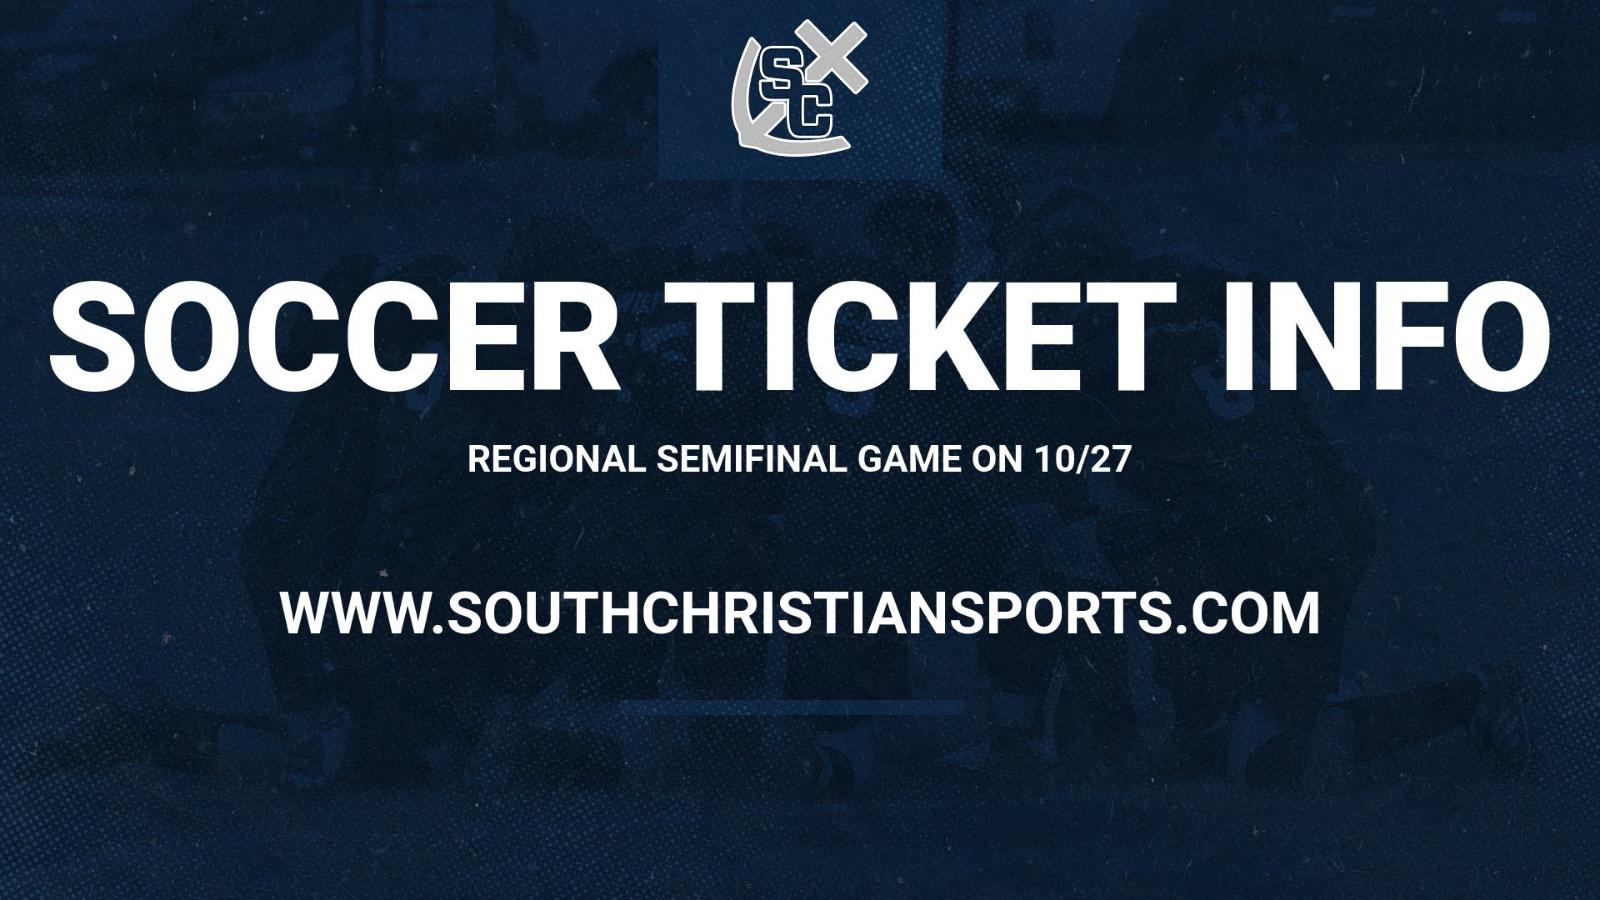 Soccer Ticket Info for Regional Semifinal on 10/27